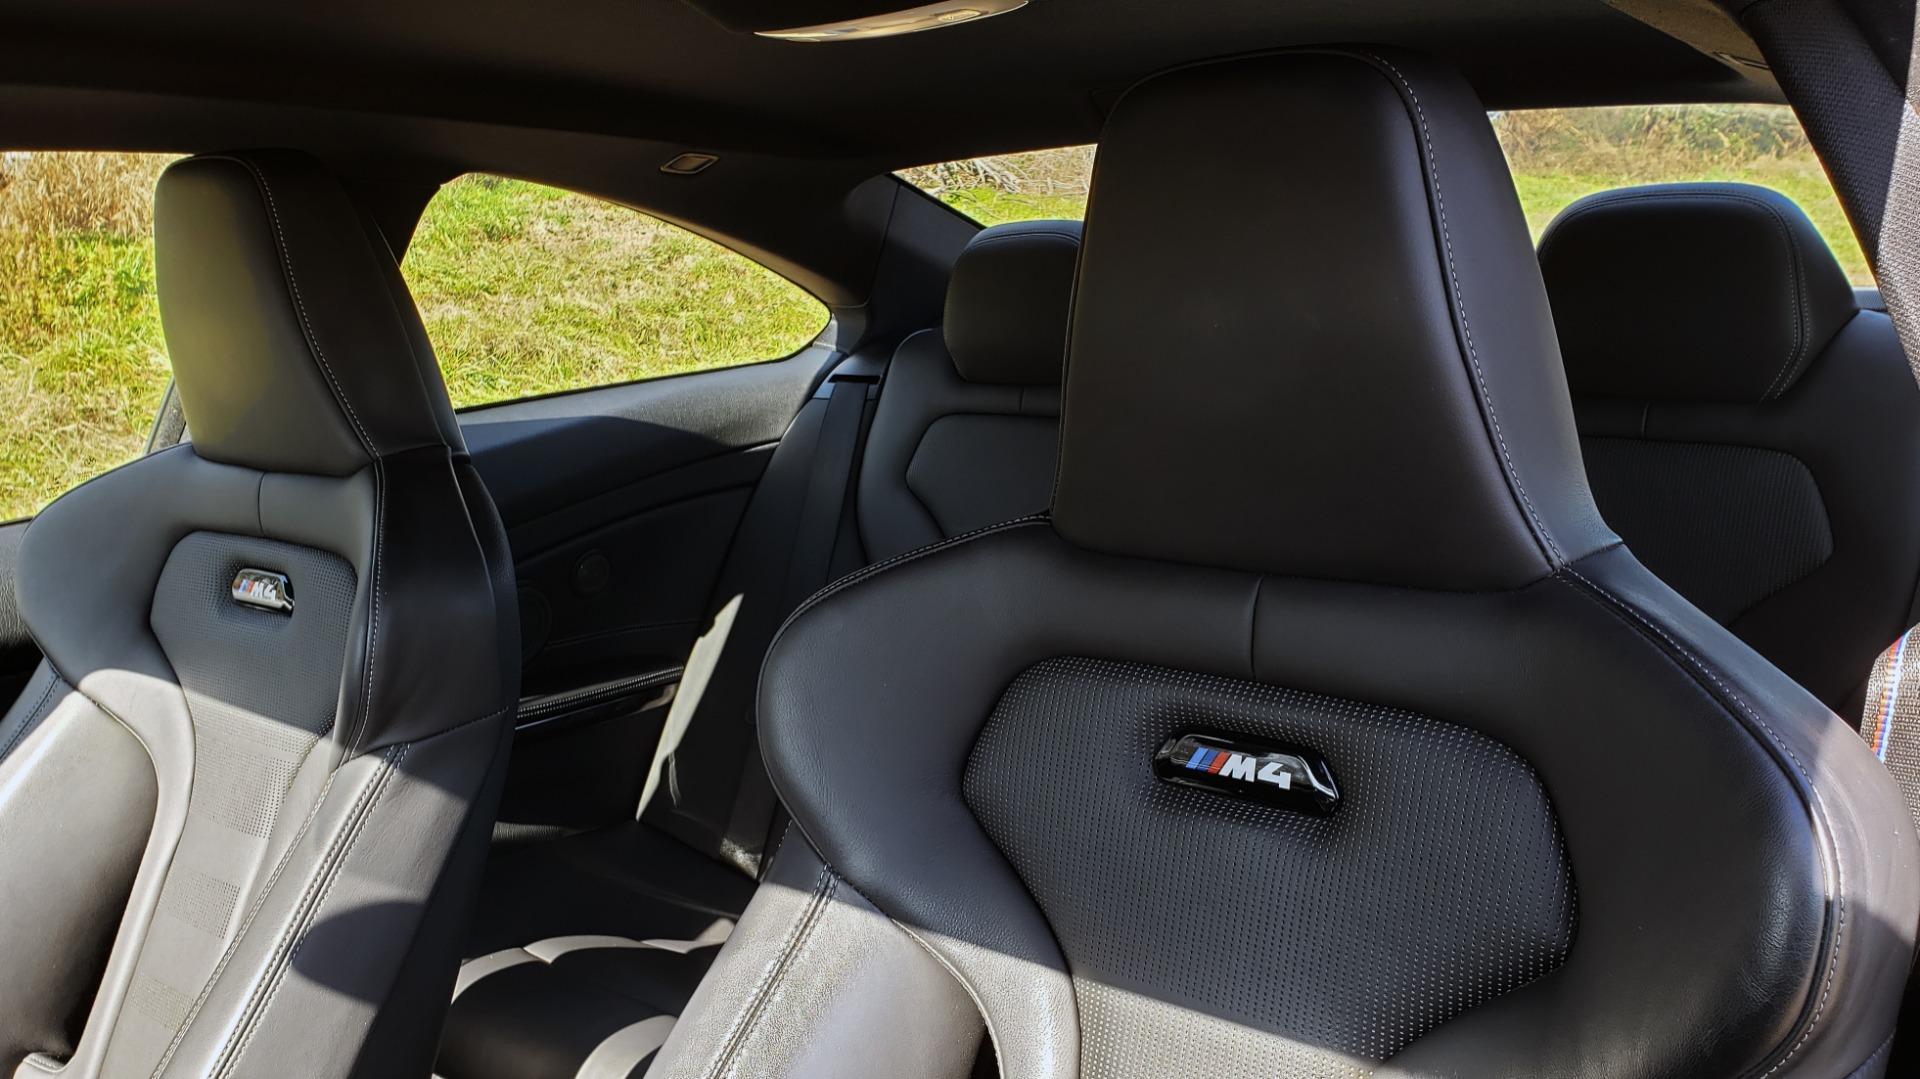 Used 2018 BMW M4 COMP PKG / EXEC / M-DRIVER / PARK CNTRL / ACTIVE BLIND SPOT for sale $45,449 at Formula Imports in Charlotte NC 28227 38